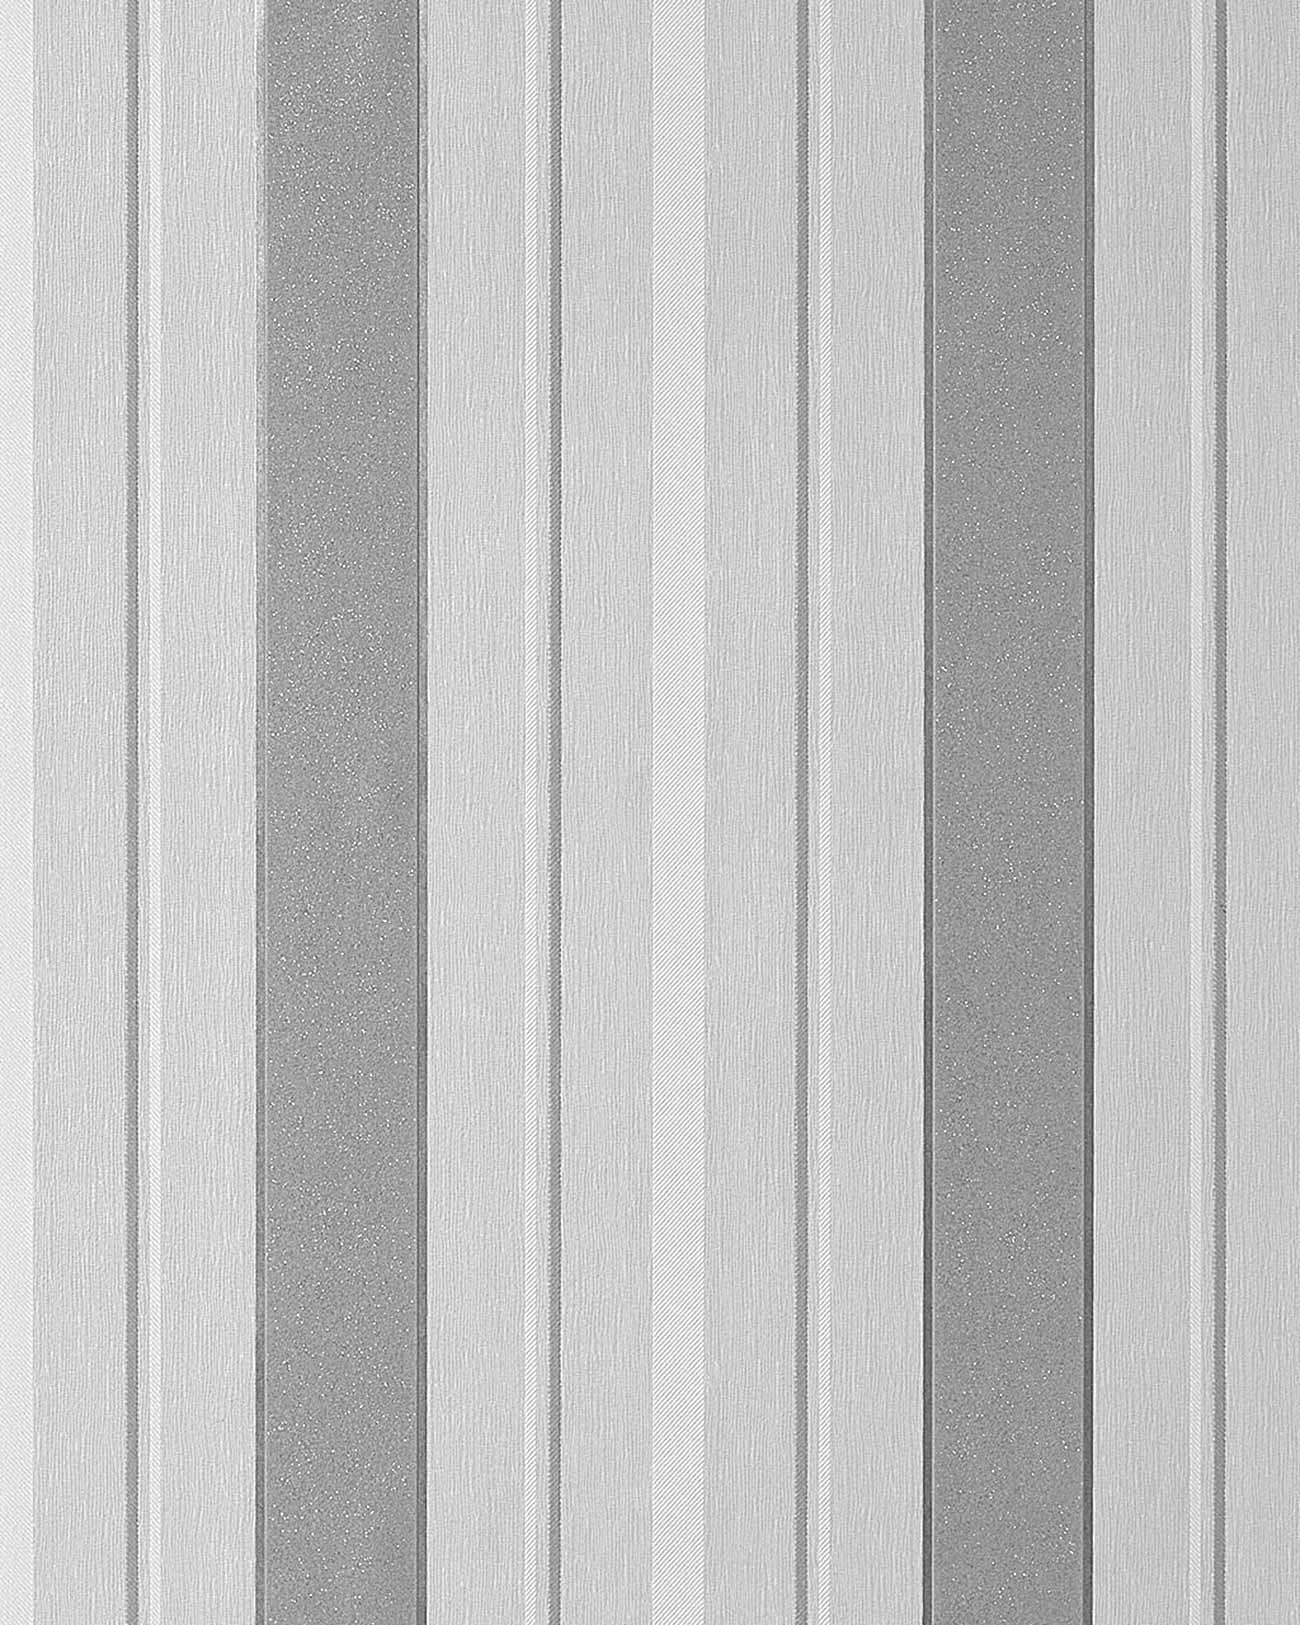 Papel pintado texturado dise o rayas gruesas edem 069 26 - Papel pintado blanco y plata ...